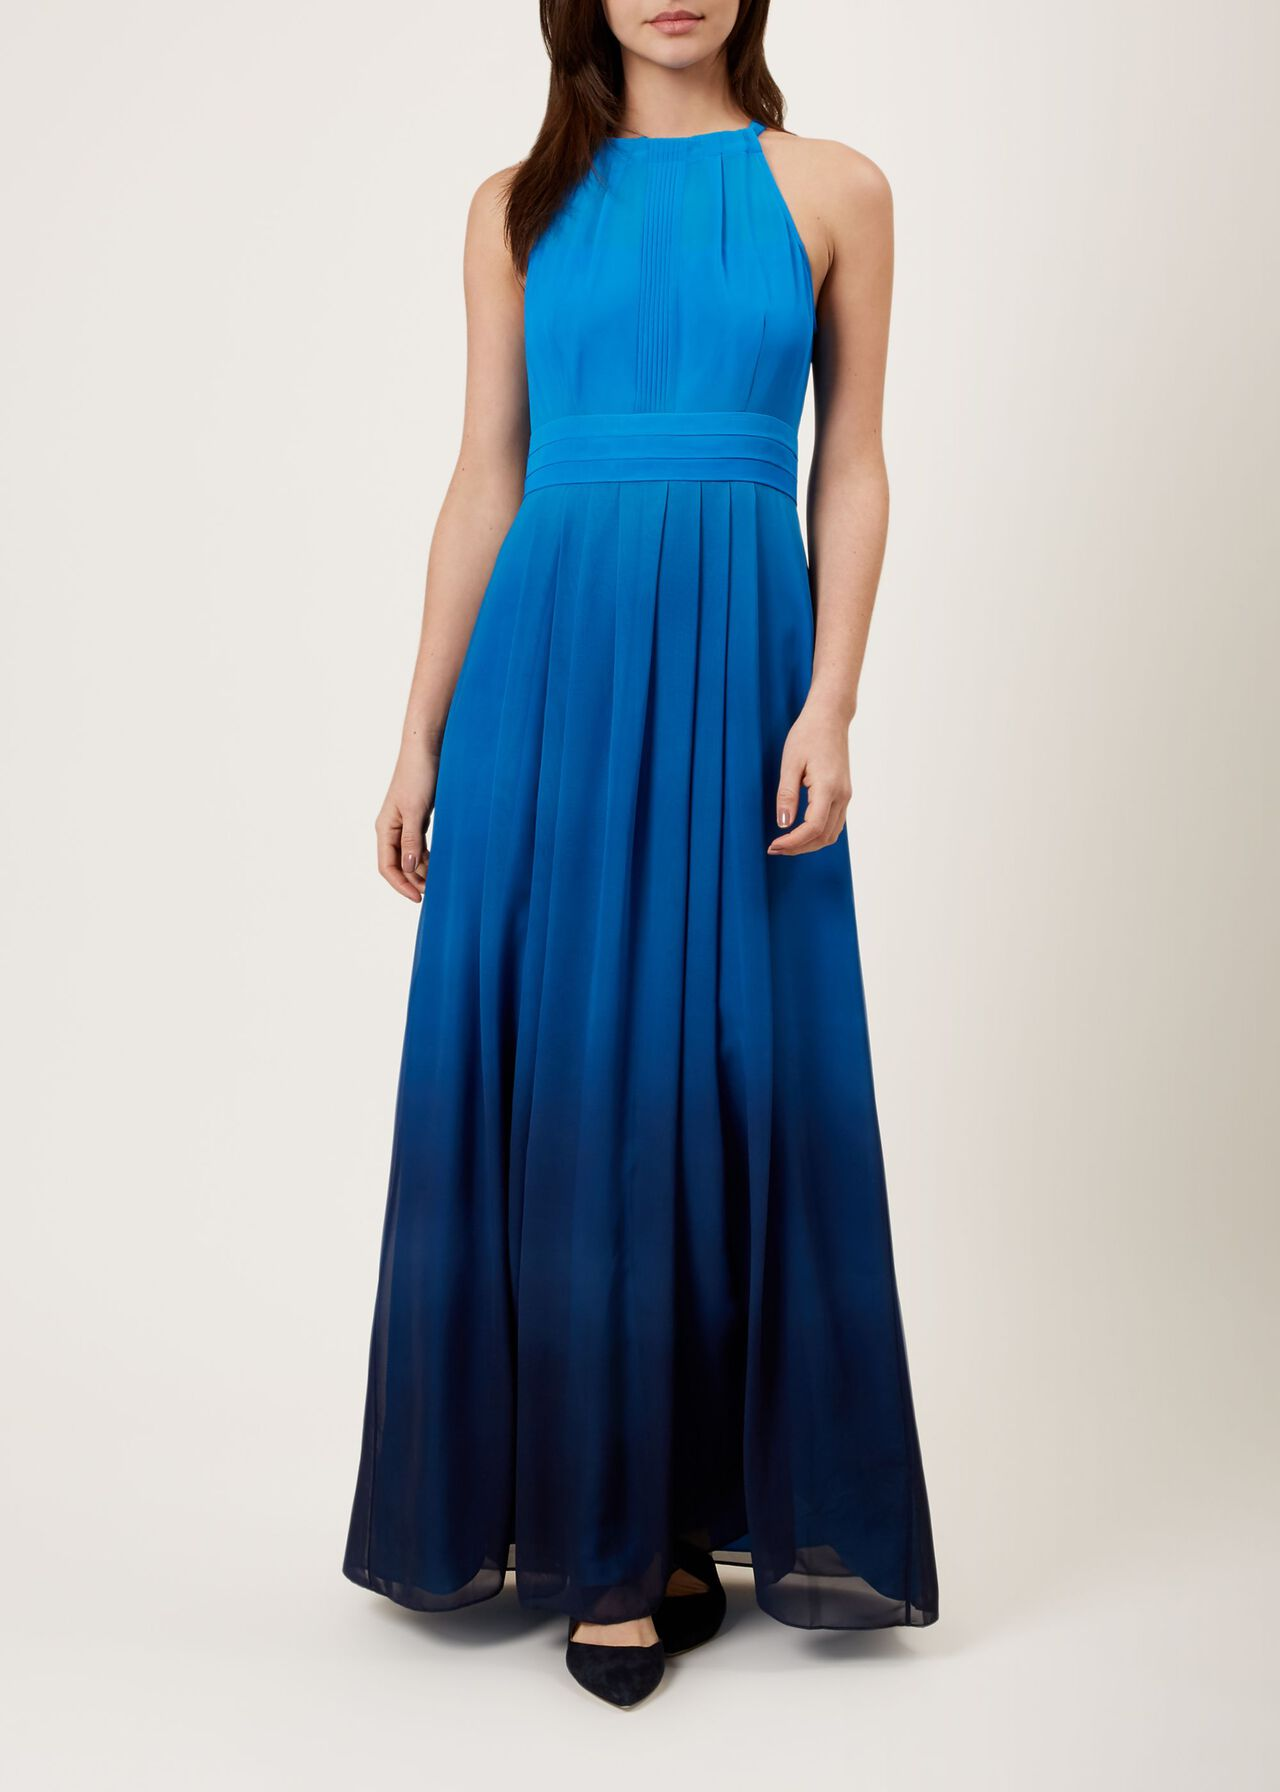 Alexis Maxi Dress Kingfisher Mul